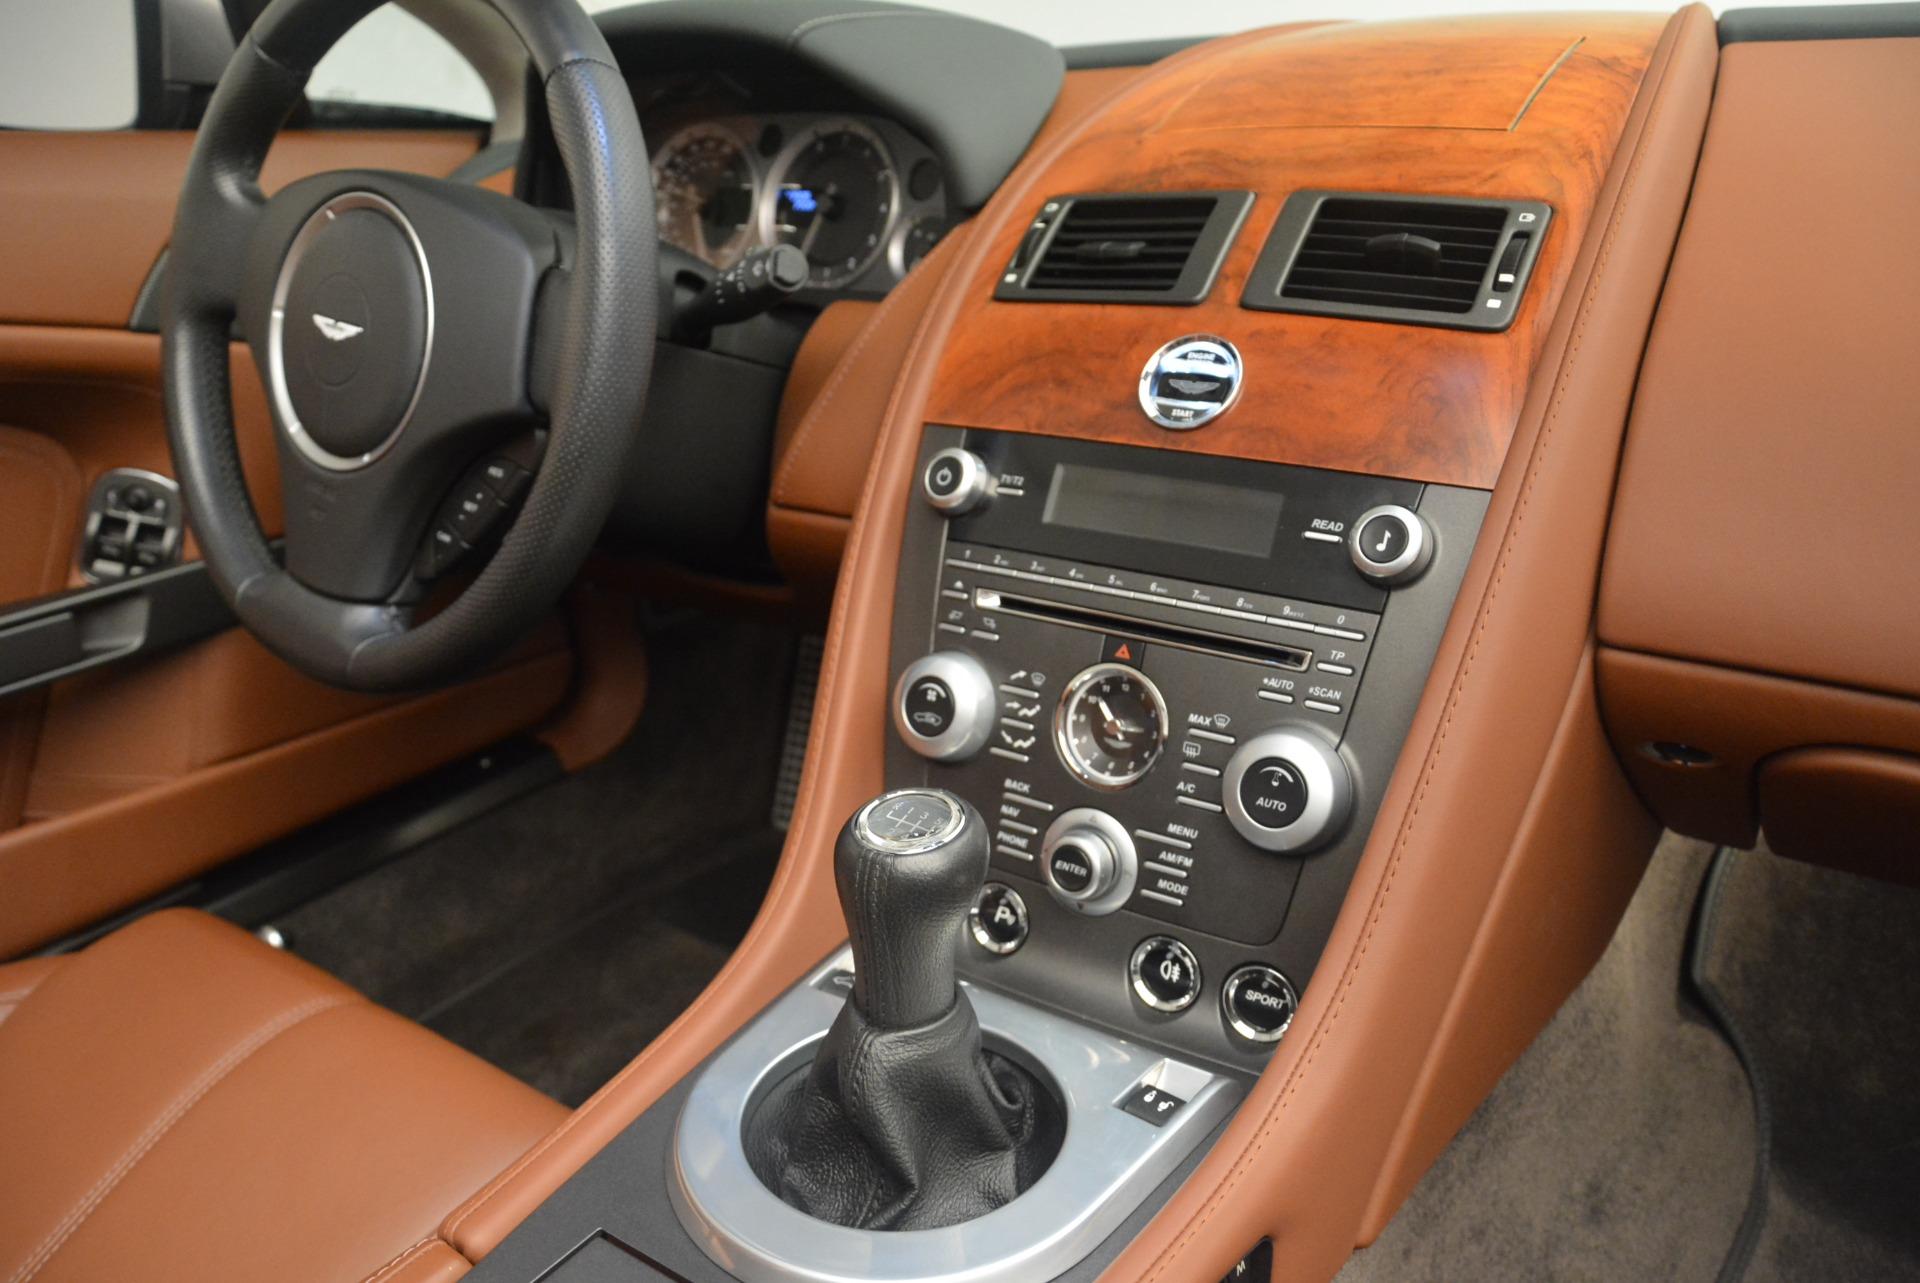 Used 2015 Aston Martin V8 Vantage Roadster For Sale In Westport, CT 2463_p23